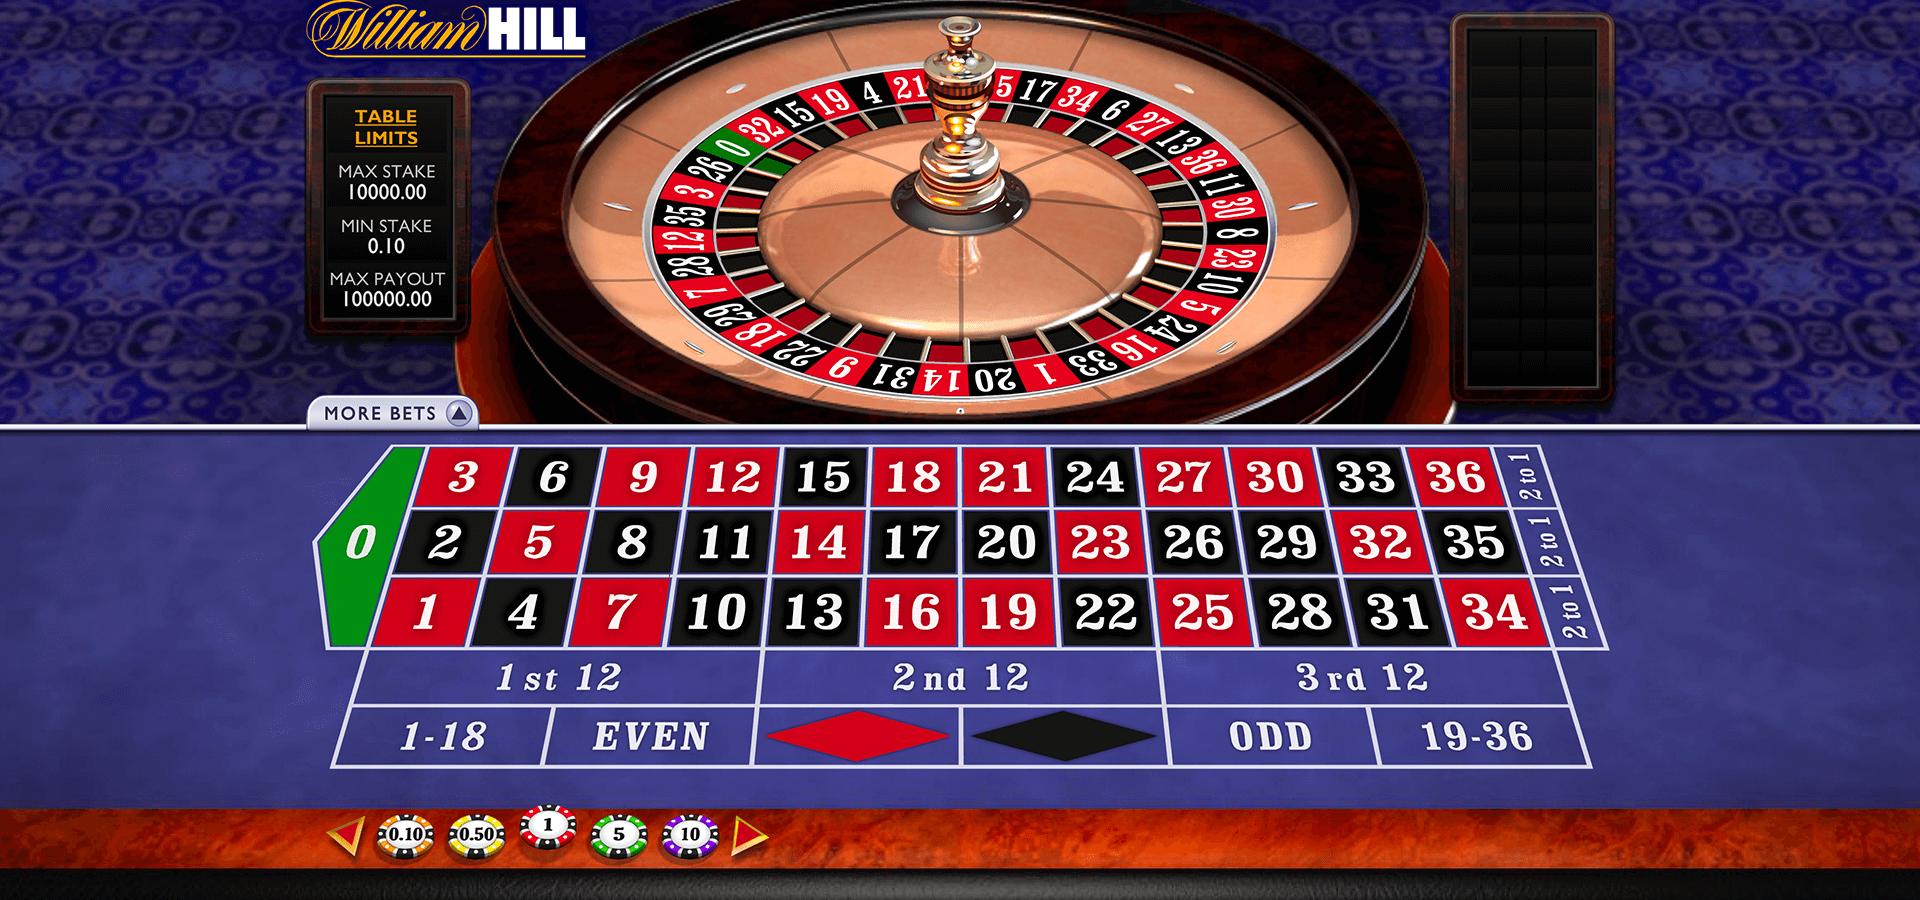 William hill international mejores casino Paraguay - 46050